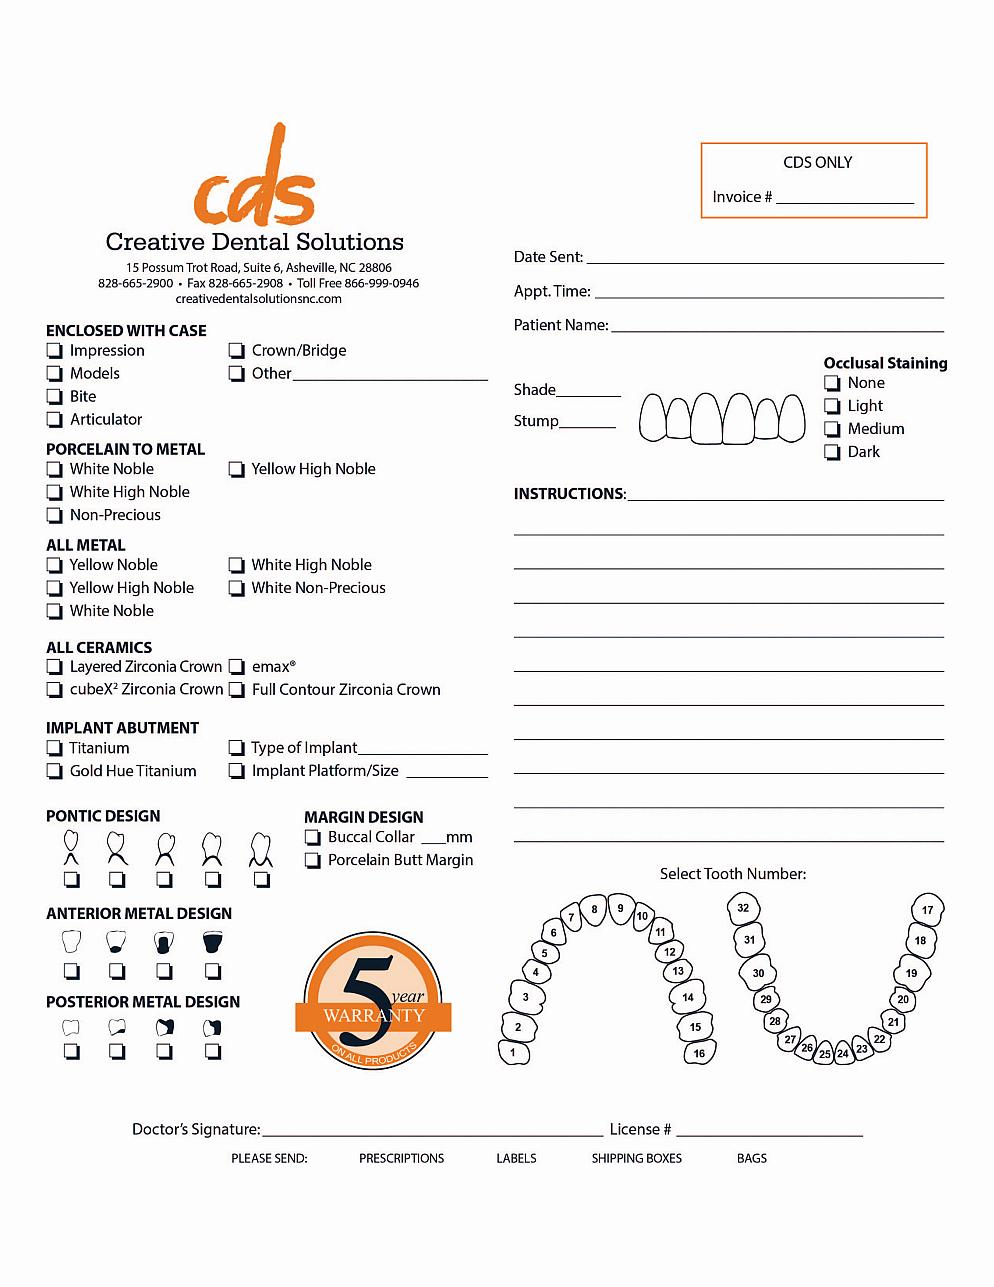 CDS Rx Form